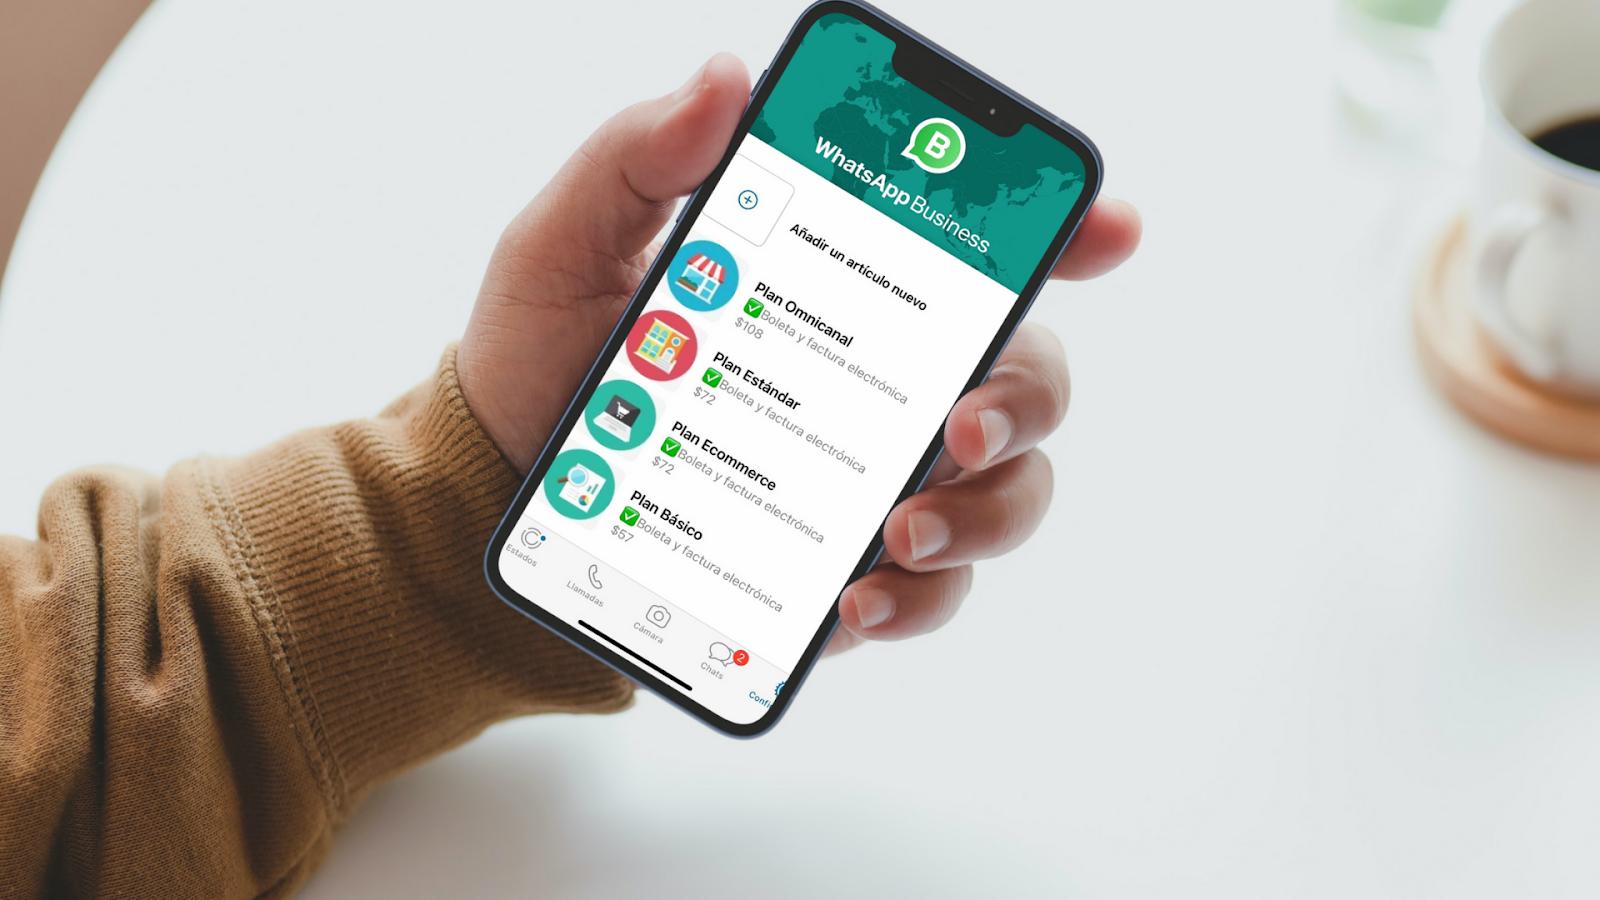 Catálogo de Whatsapp